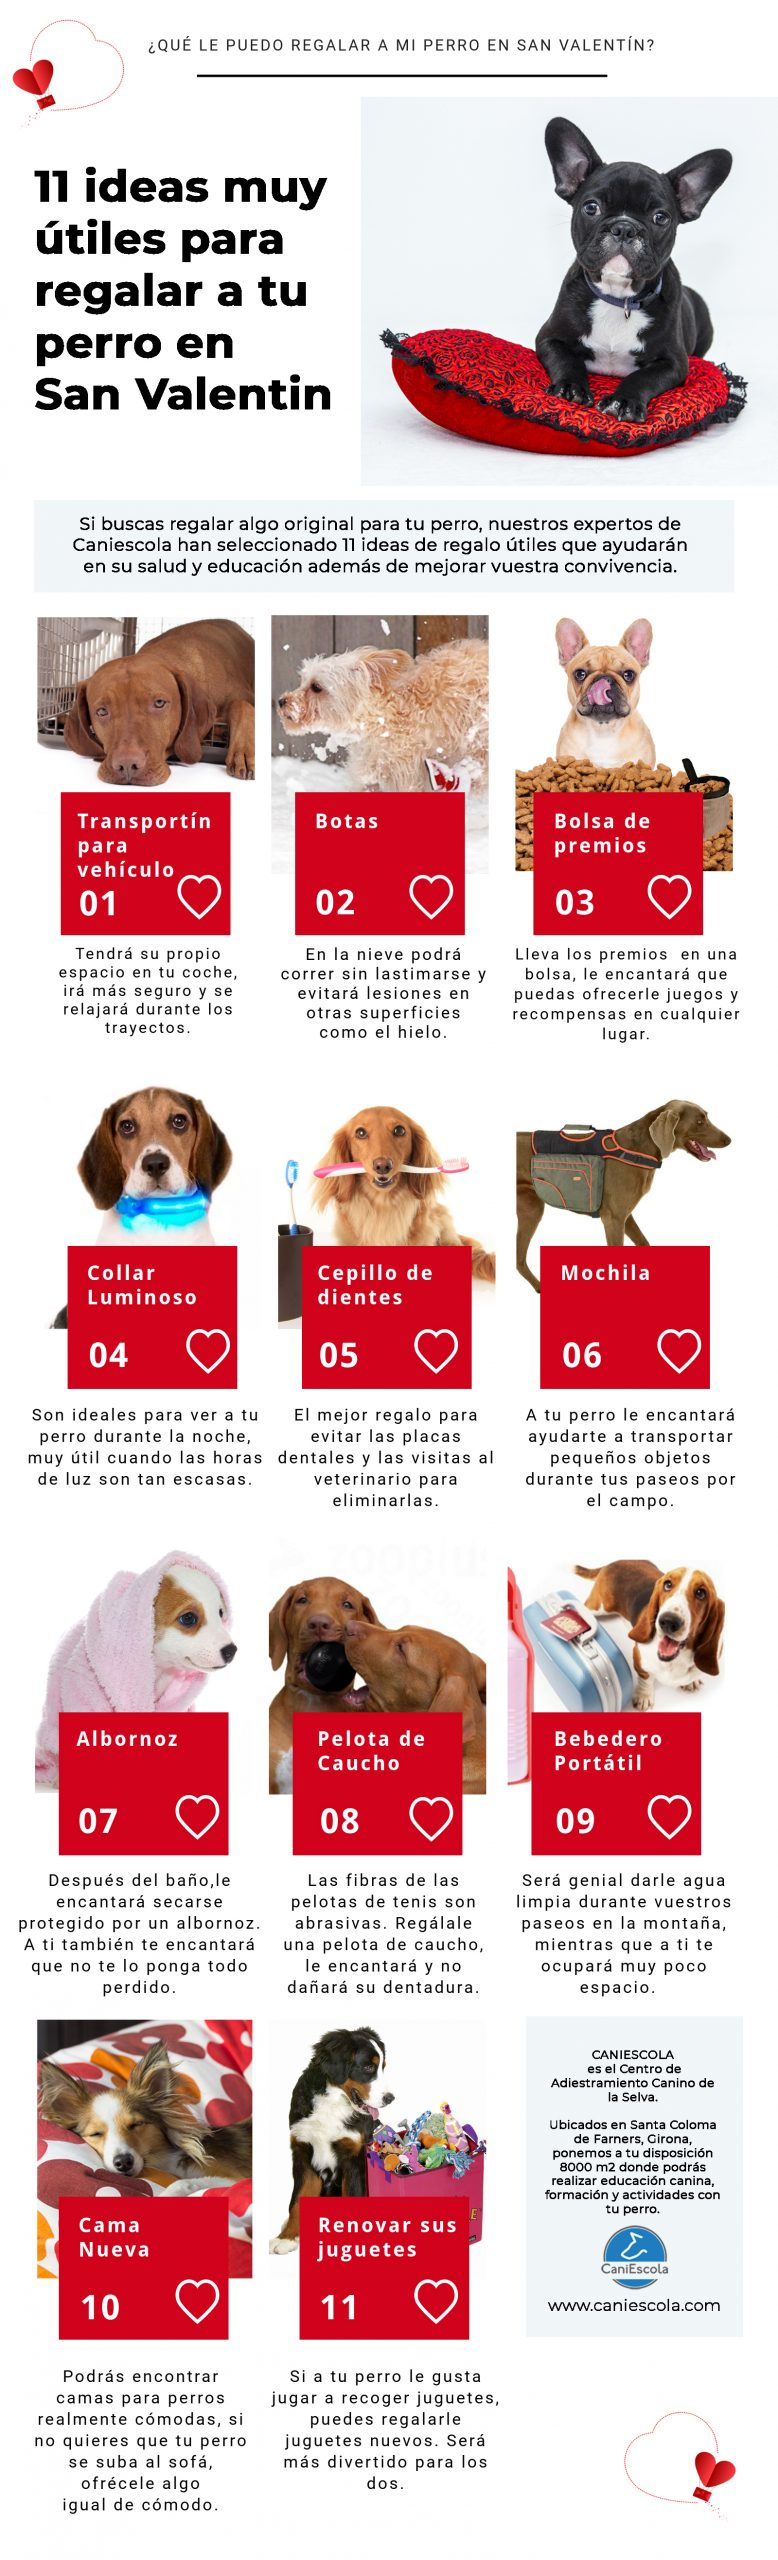 regalos-utiles-perros-san-valentin-caniescola